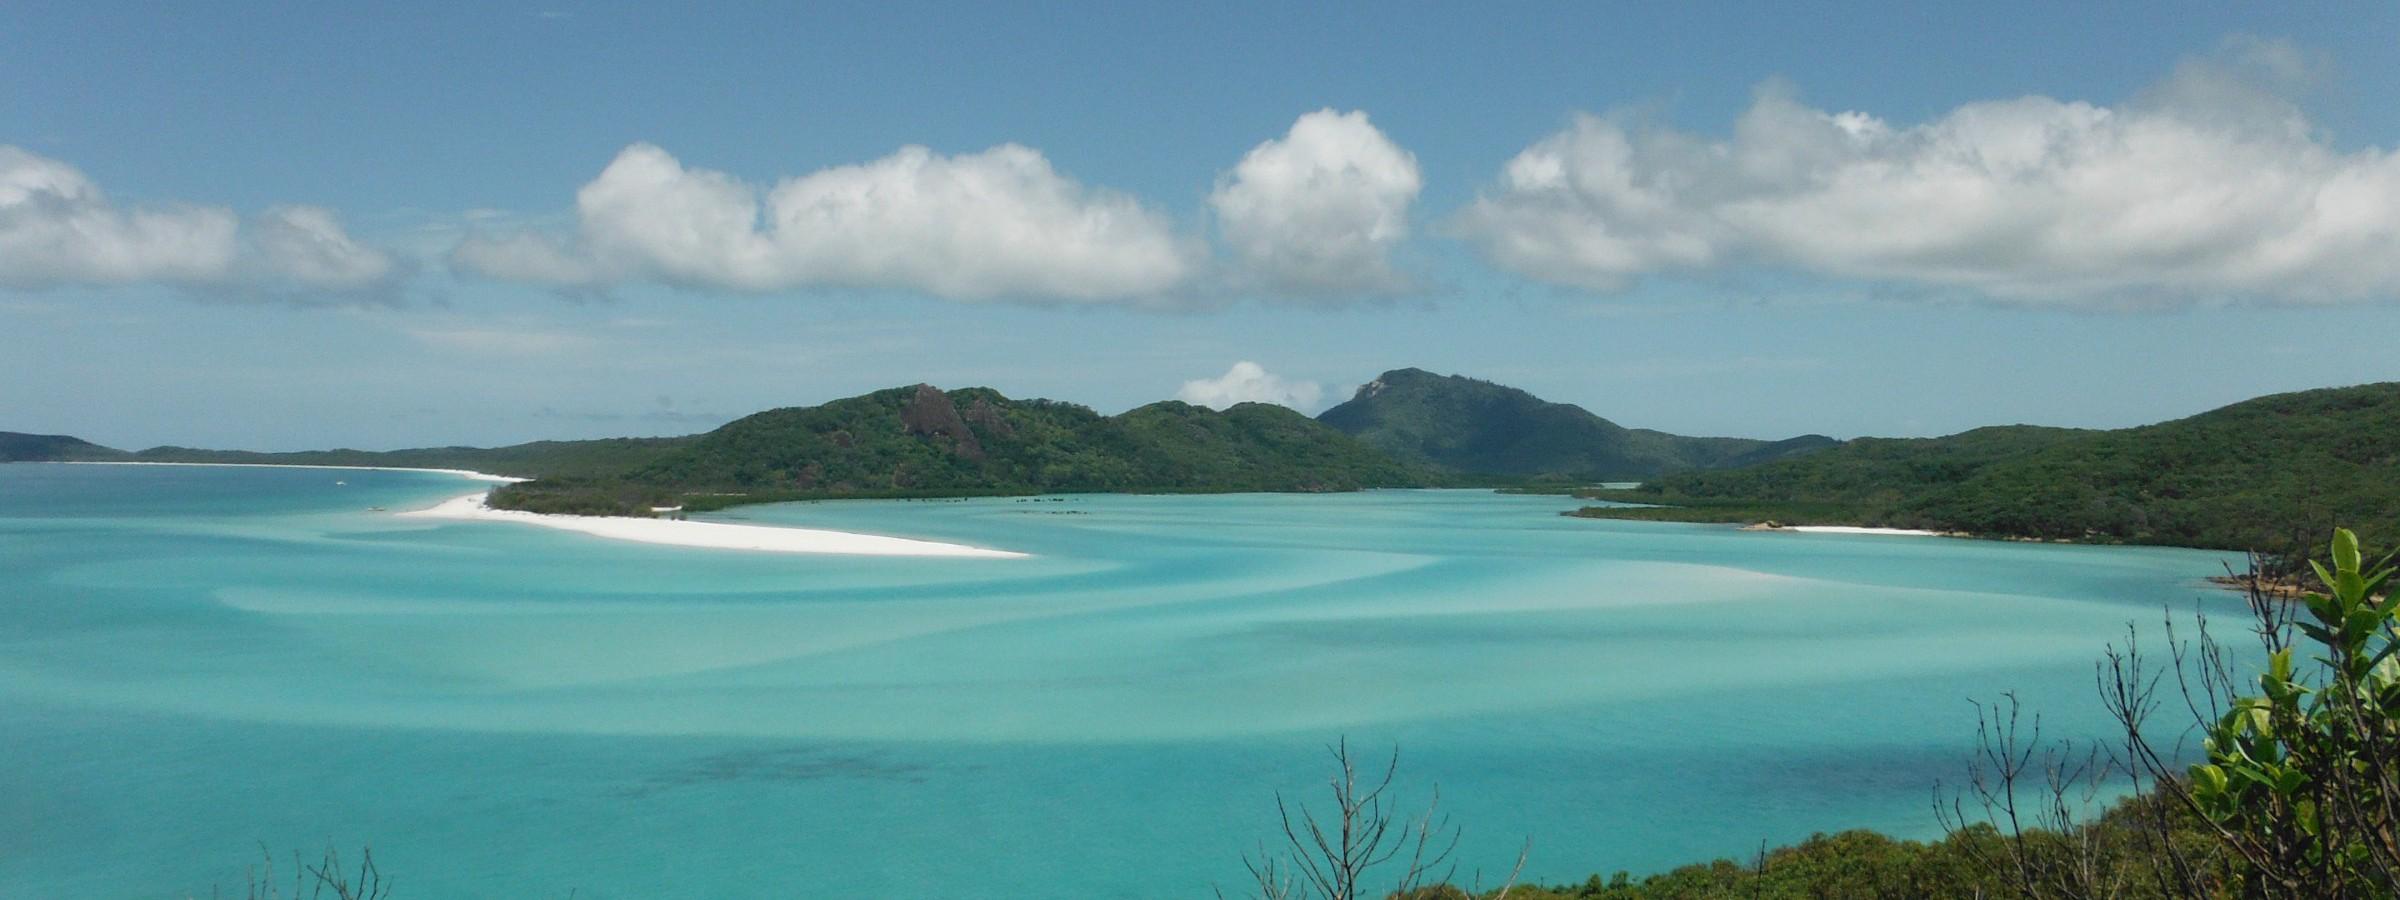 photo essay s most famous beach whitehaven qld  photo essay s most famous beach whitehaven qld family travel blog